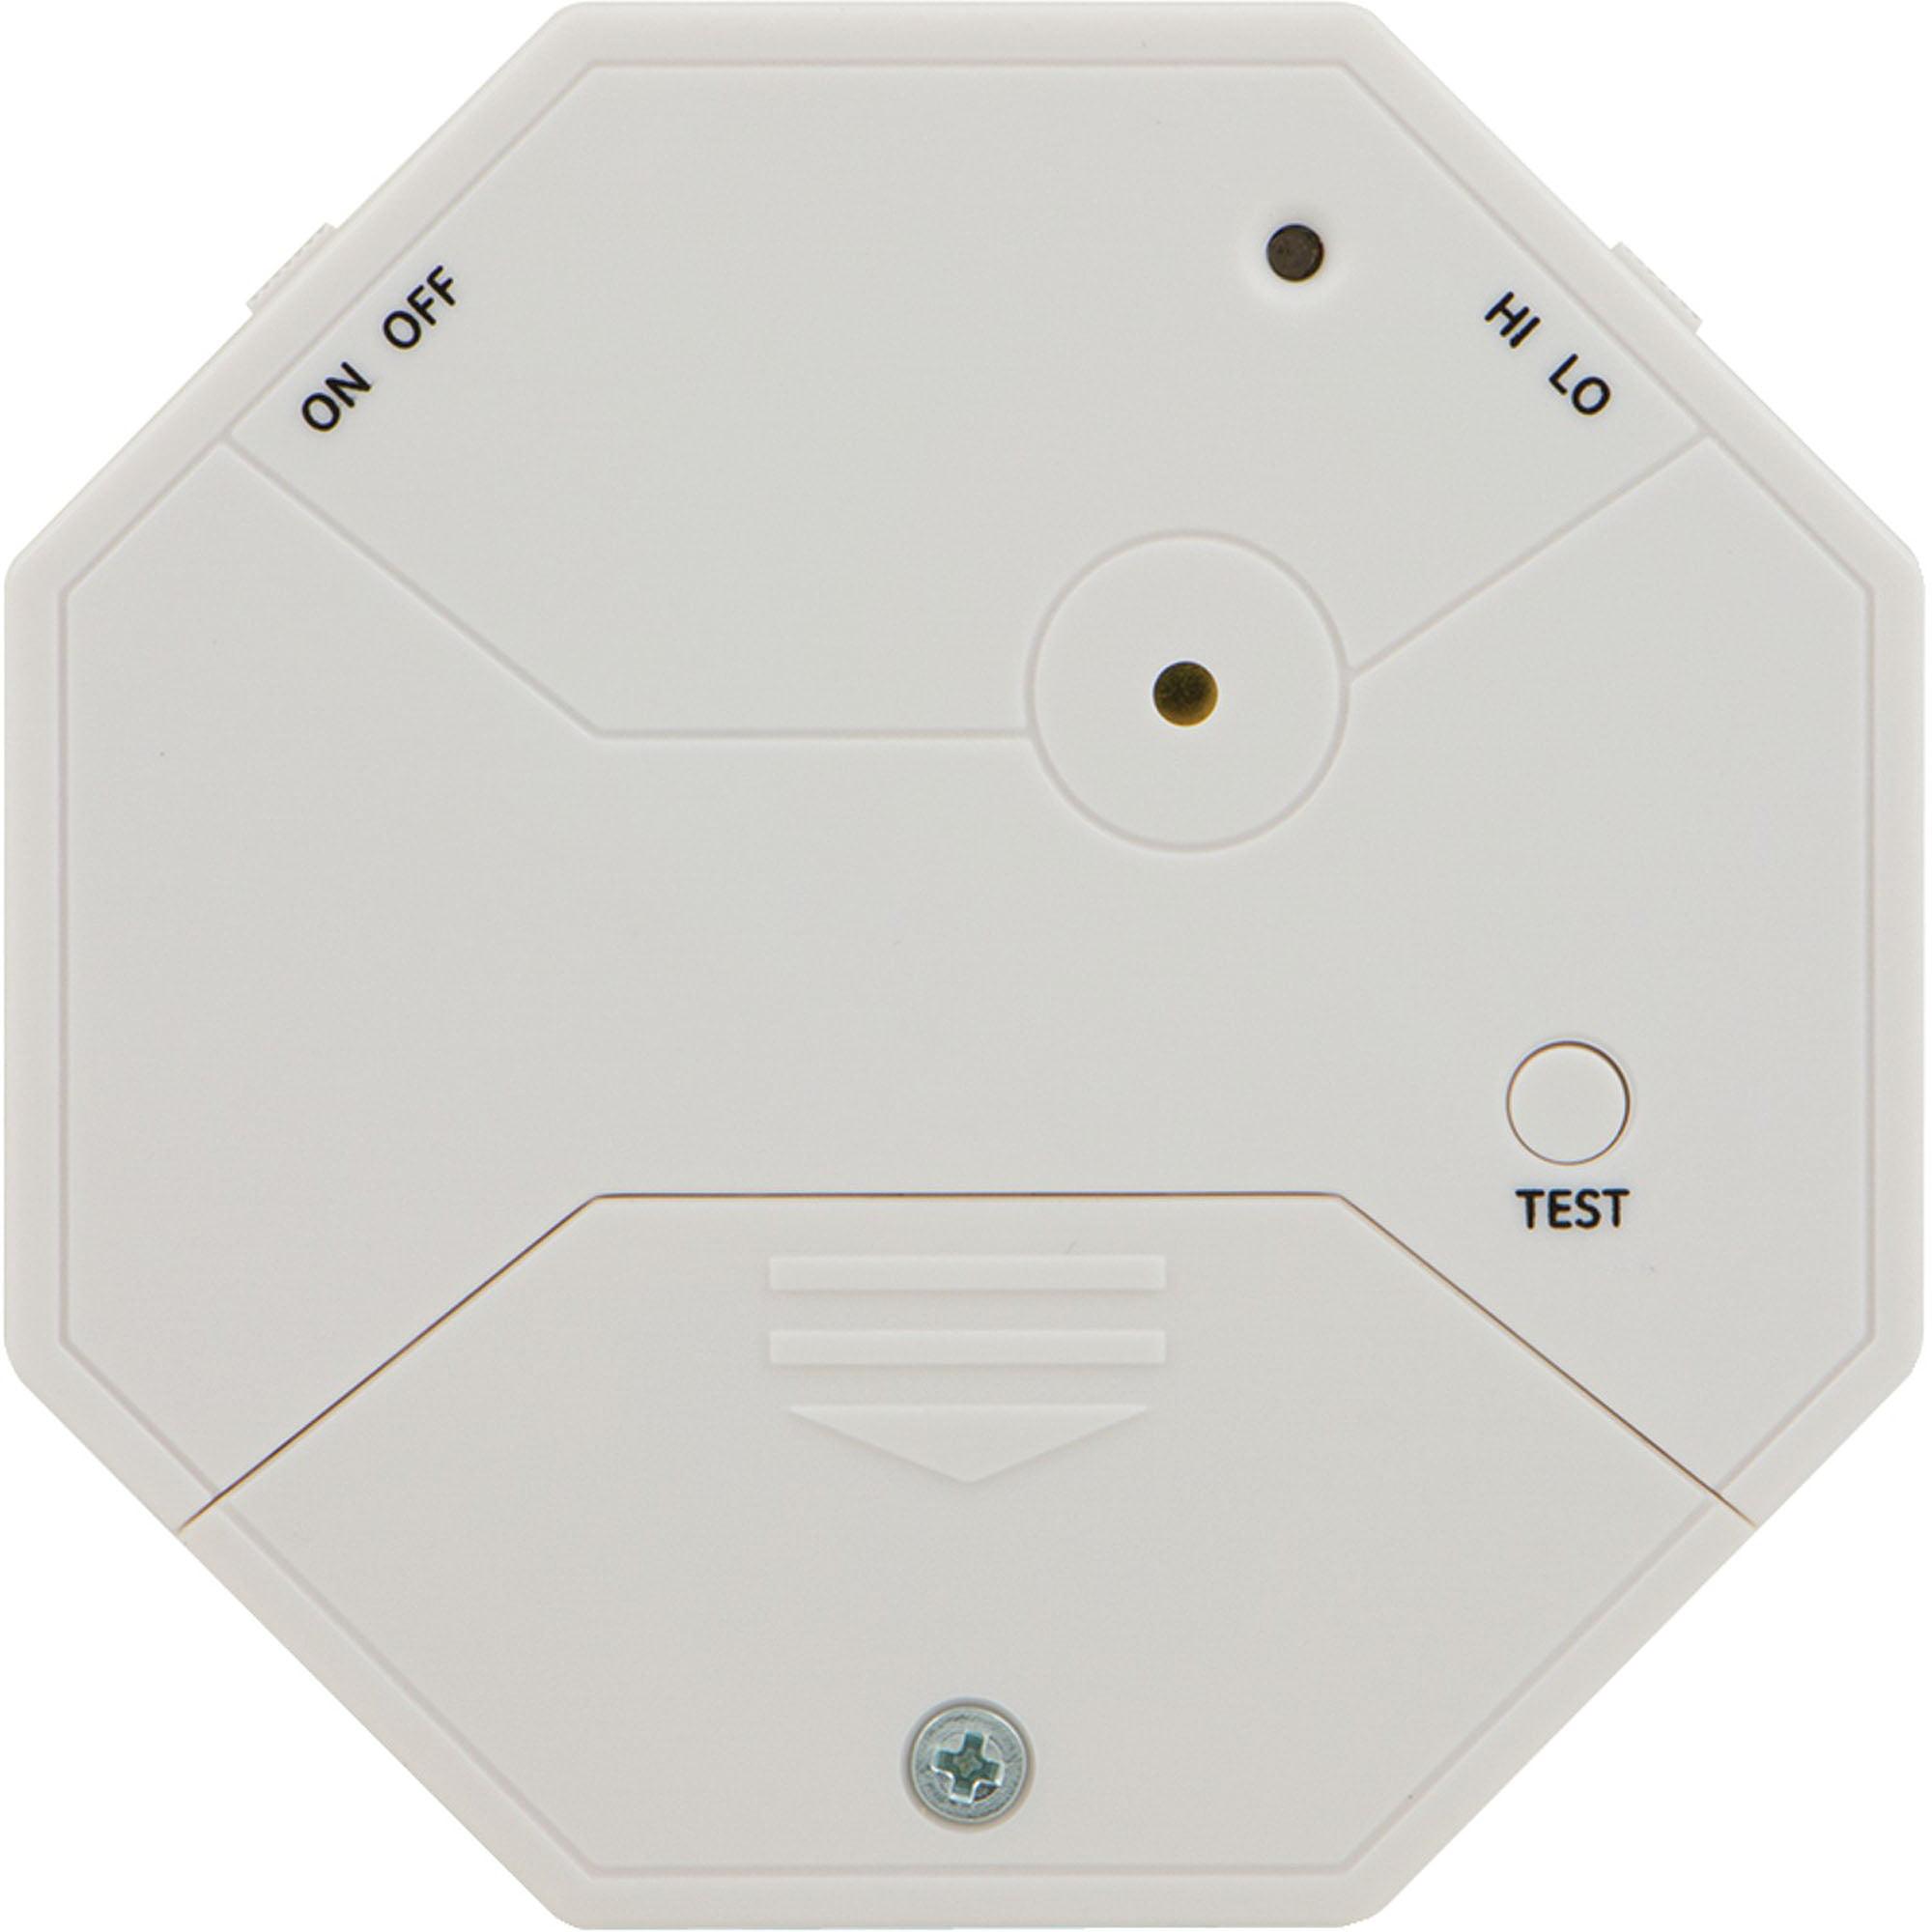 GE Glass Vibration Alarm